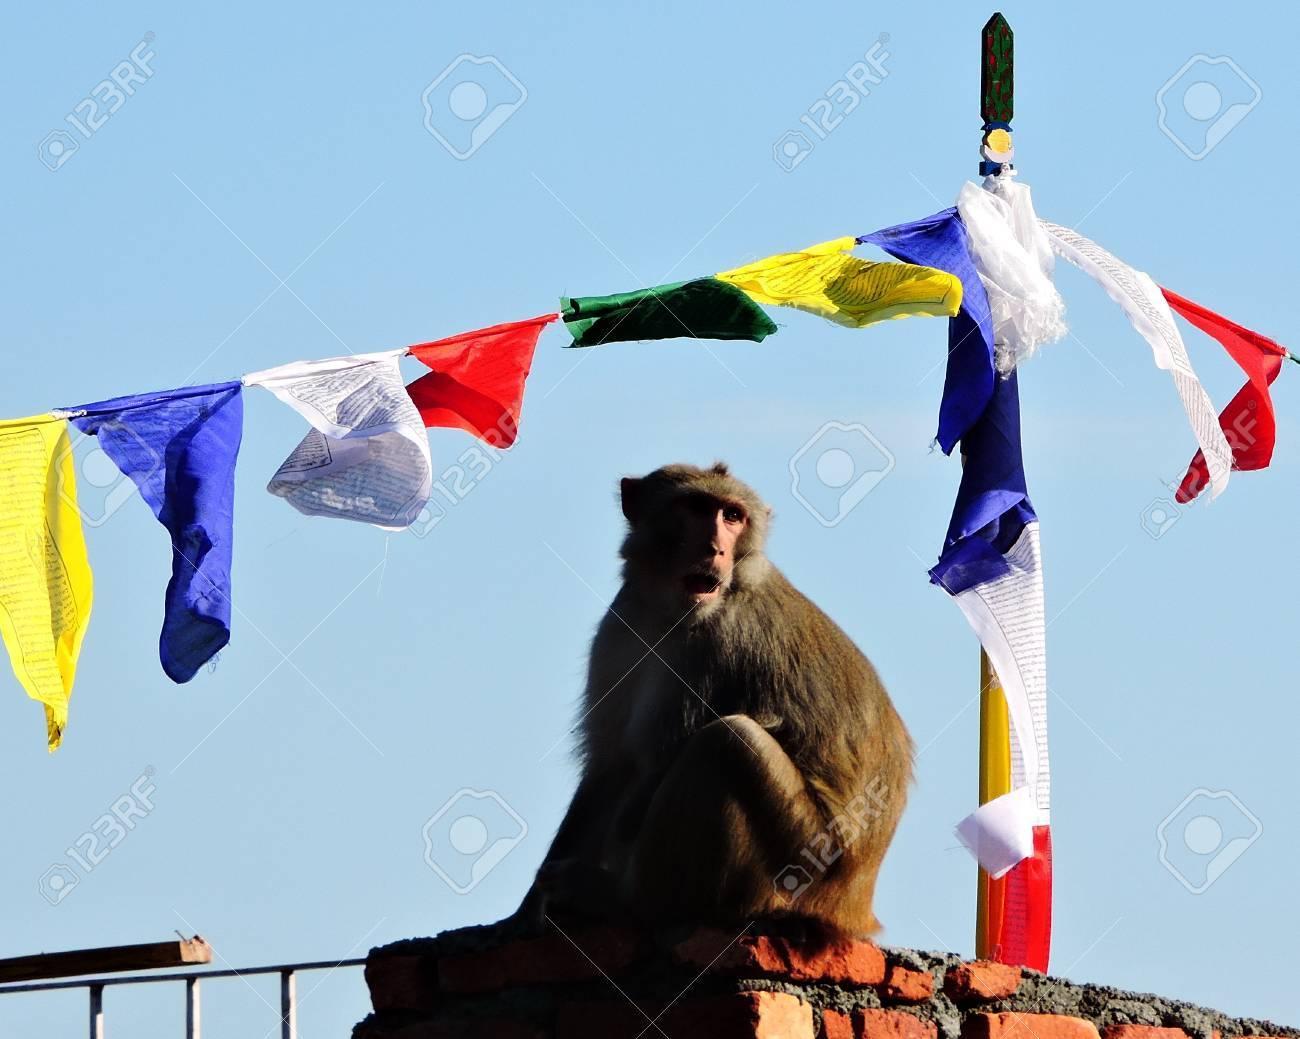 Monkey Rhesus Macaque India Stock Photo - 69419816